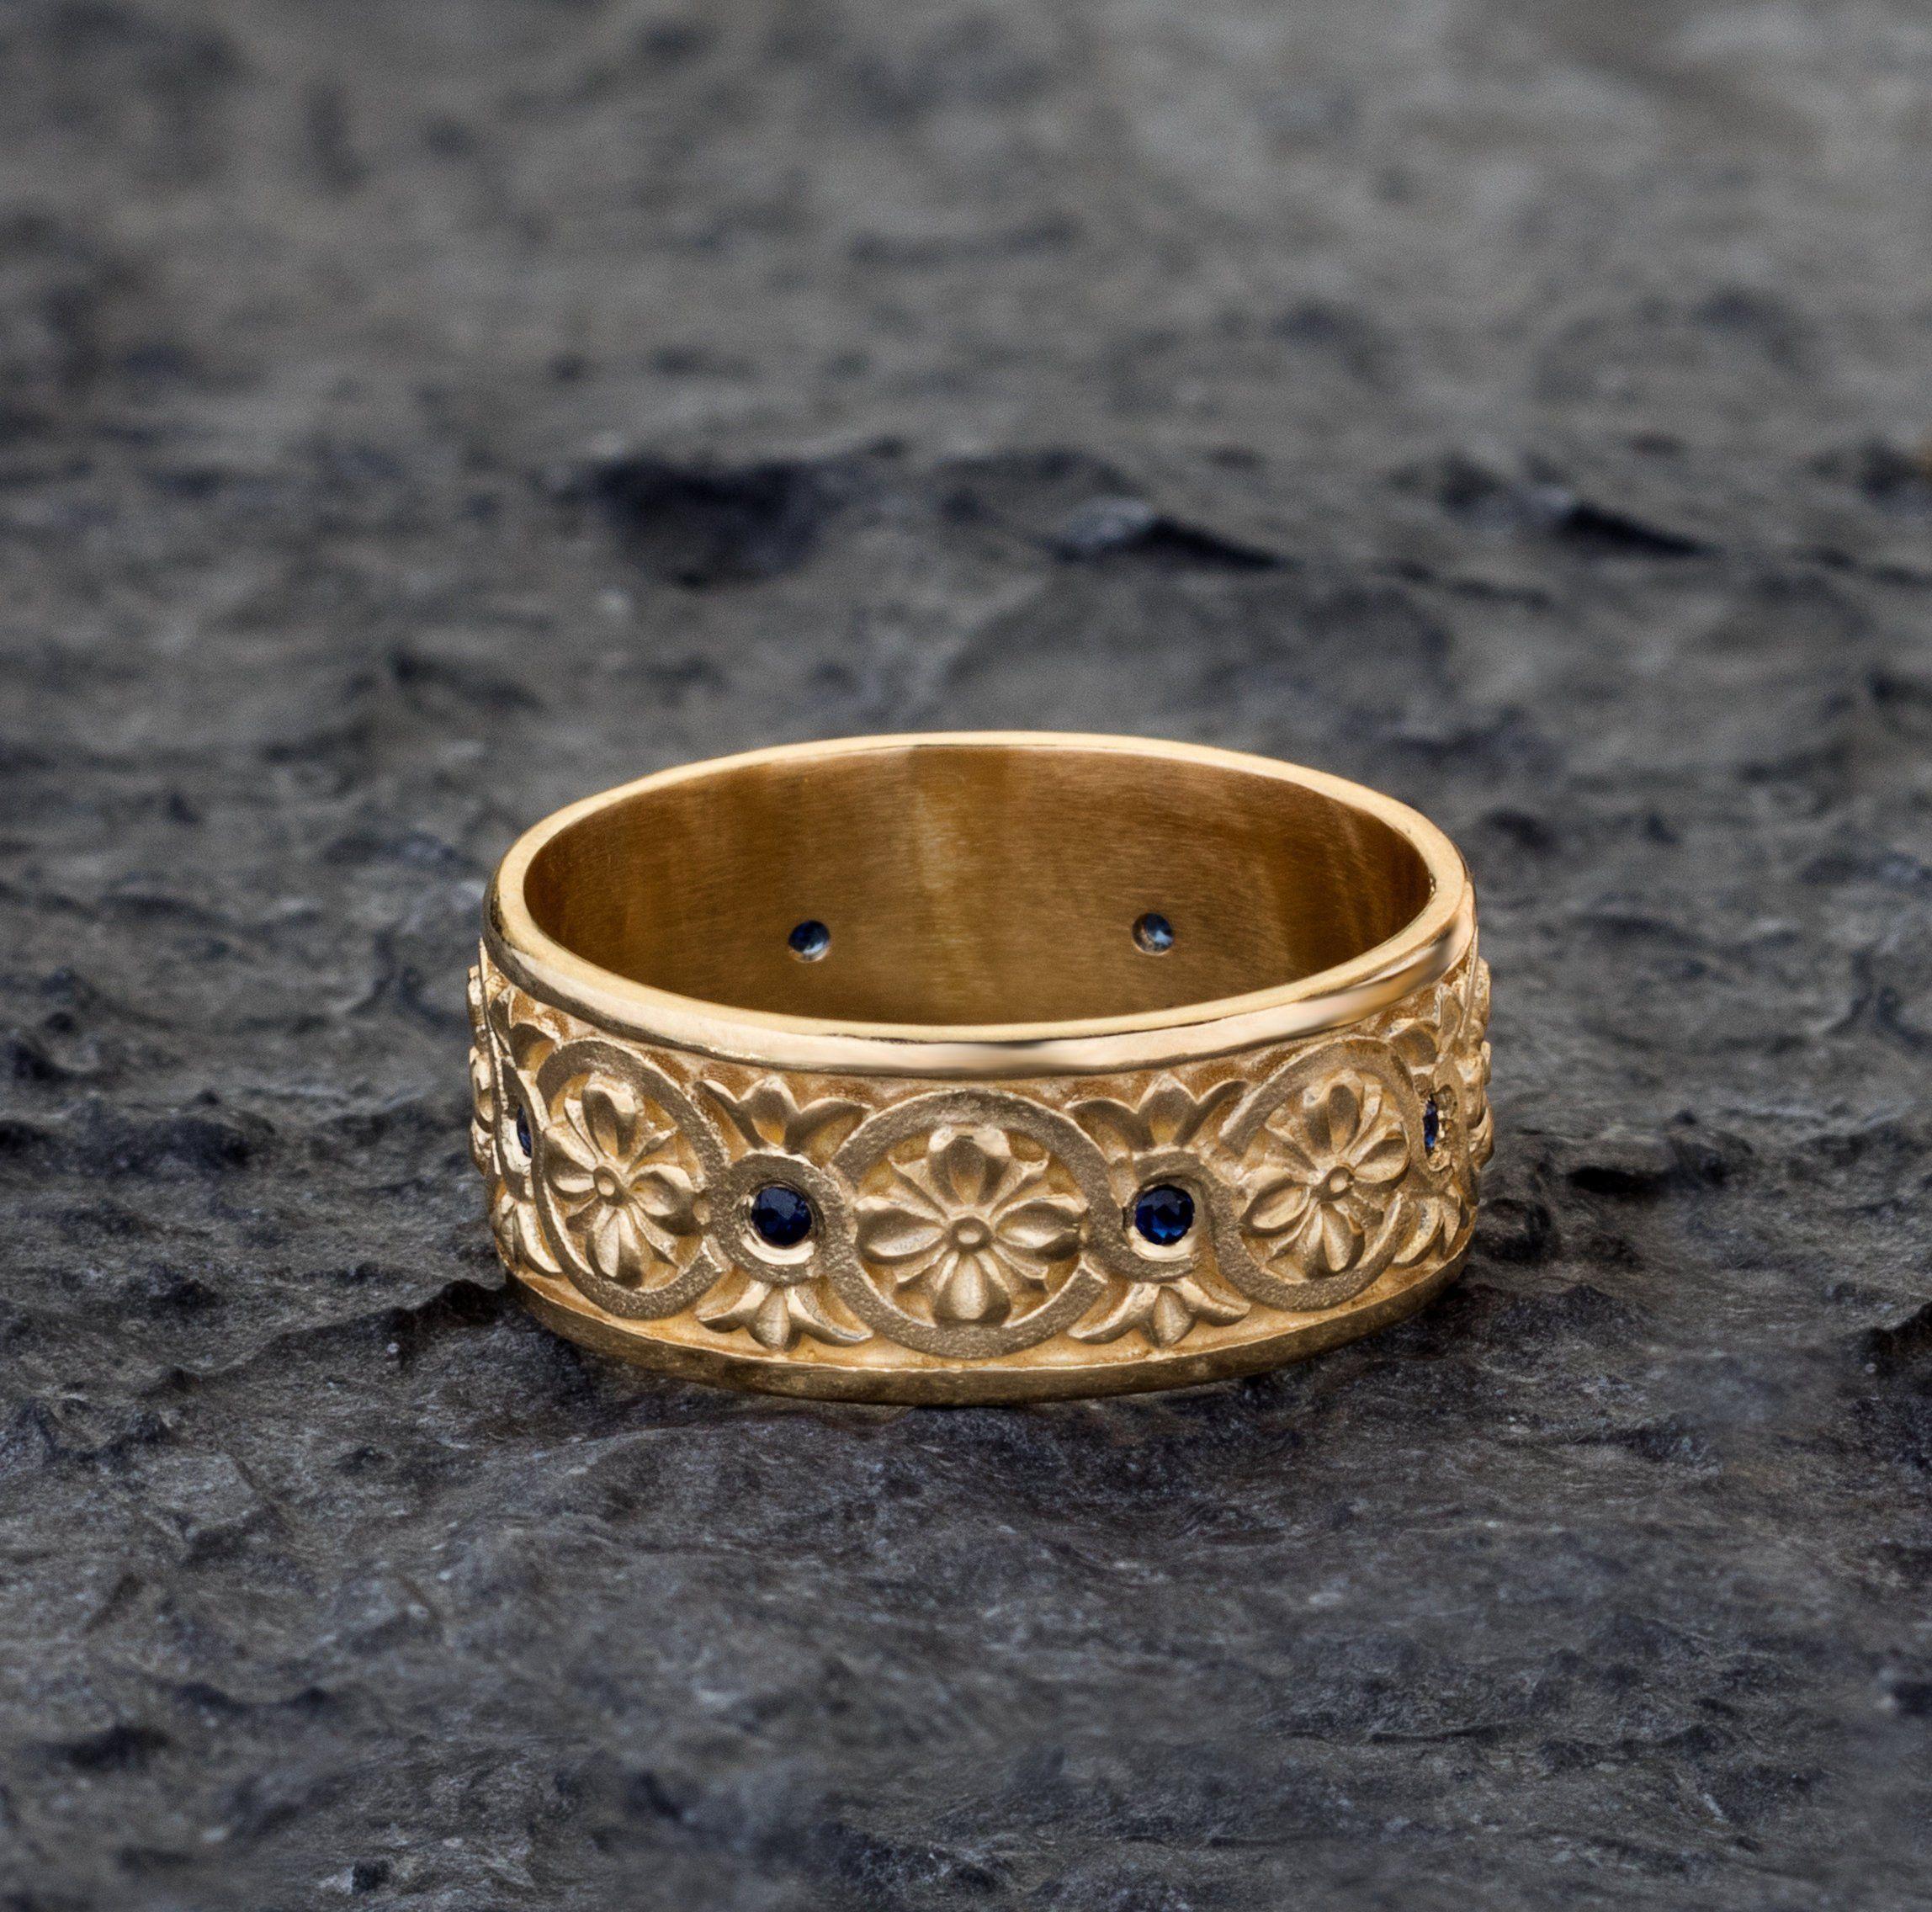 Floral Celtic Knot solid gold band, engraved mens wedding